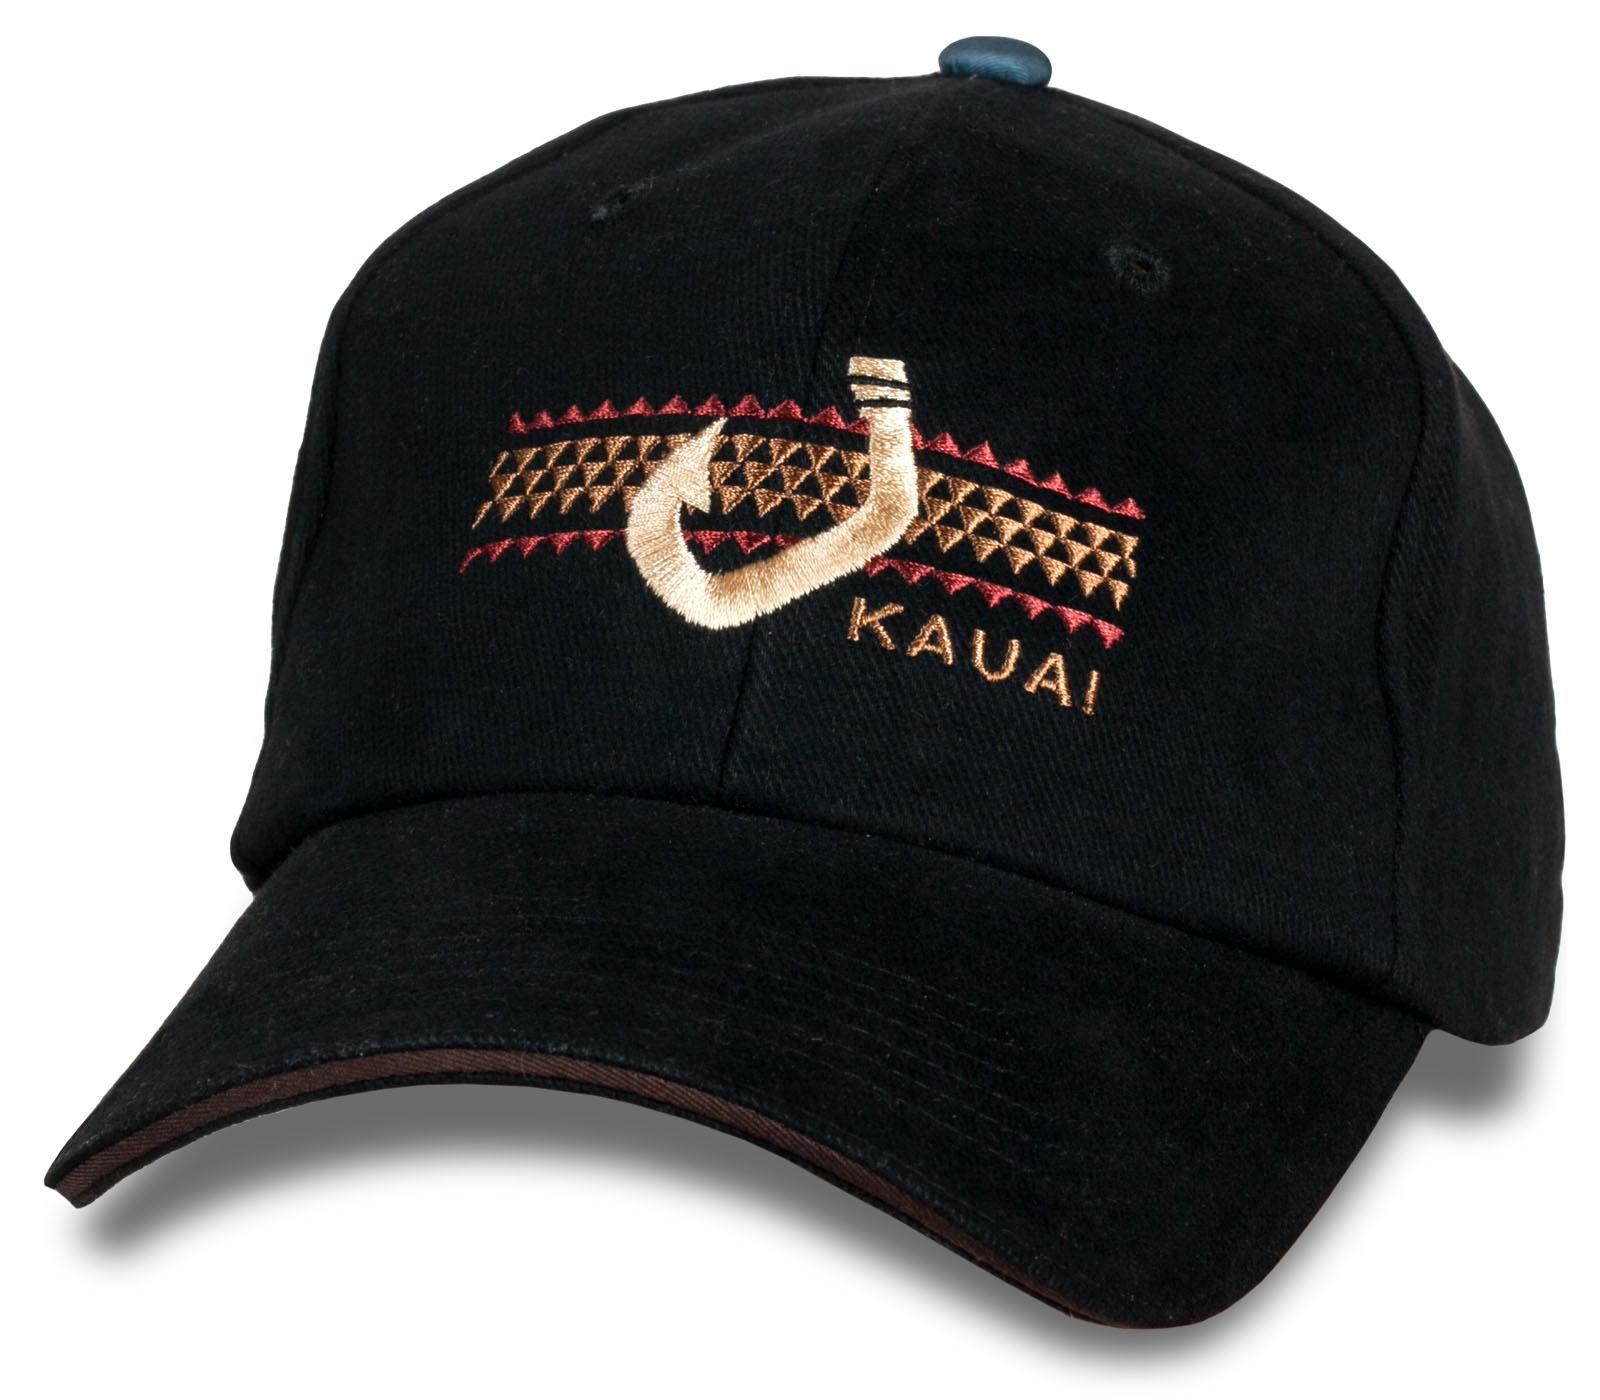 Топовая кепка-бейсболка Kauai.